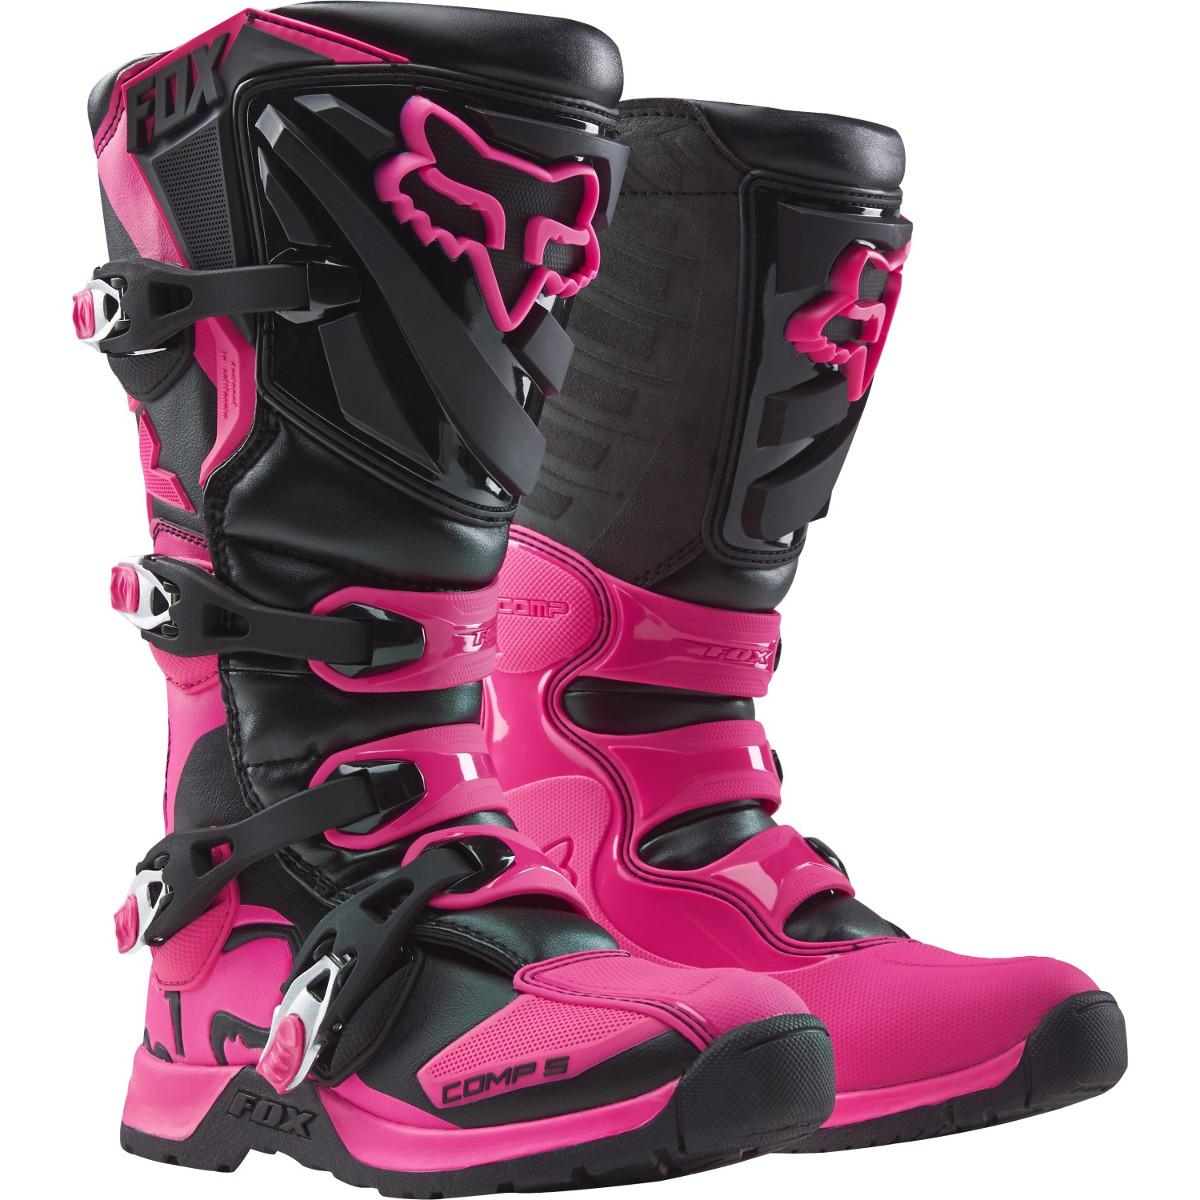 Fox Girls Motocross-Stiefel Comp 5 Schwarz/Pink